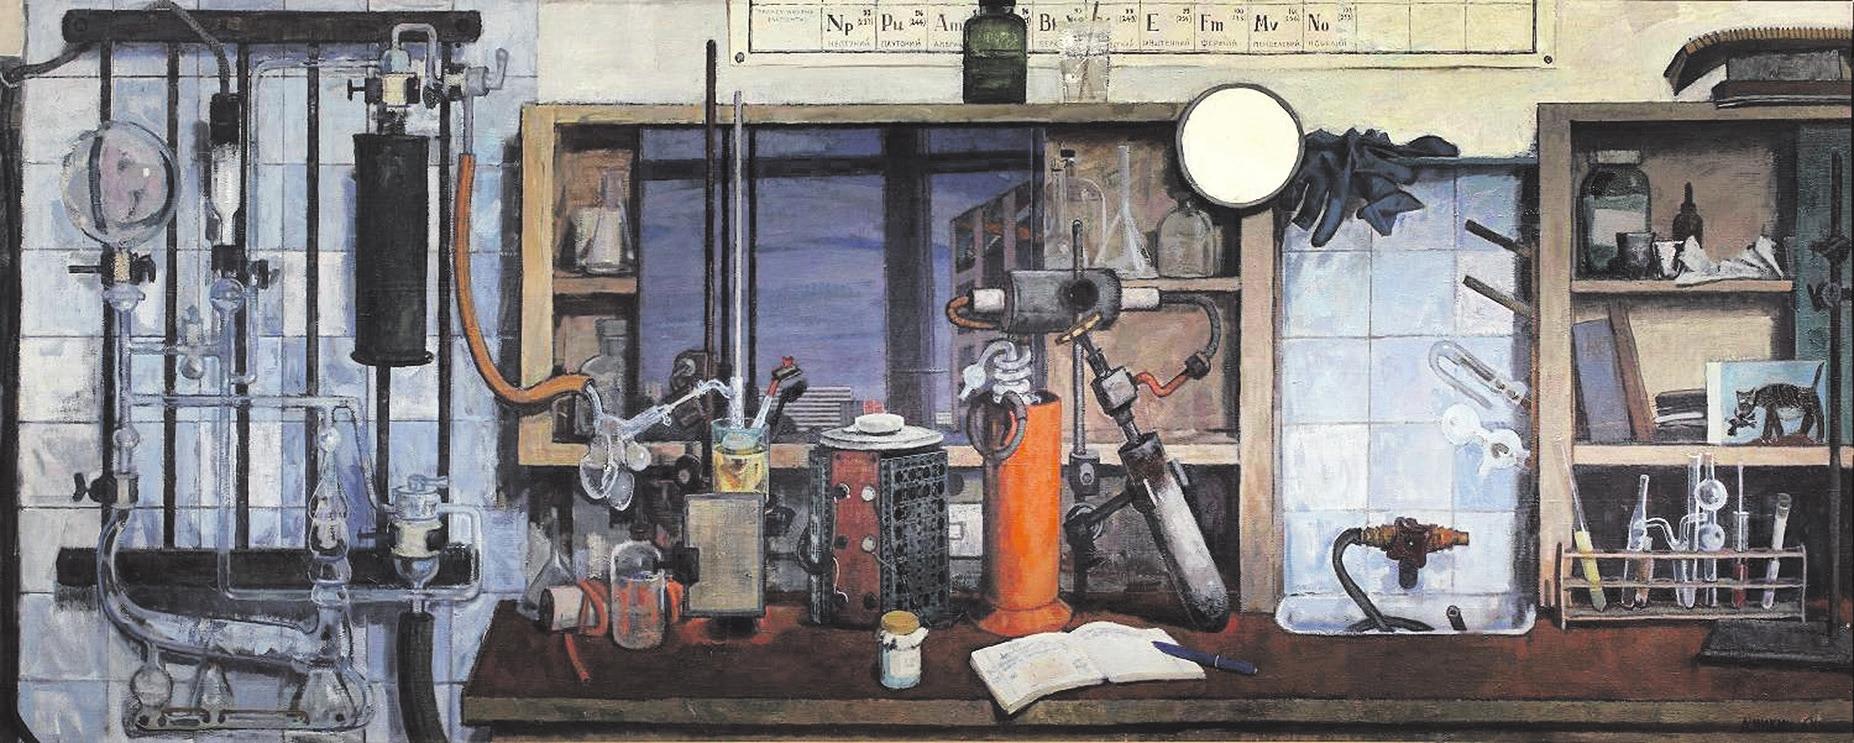 А. Никич. Химия. 1964 (фото из пресс-релиза ГТГ)